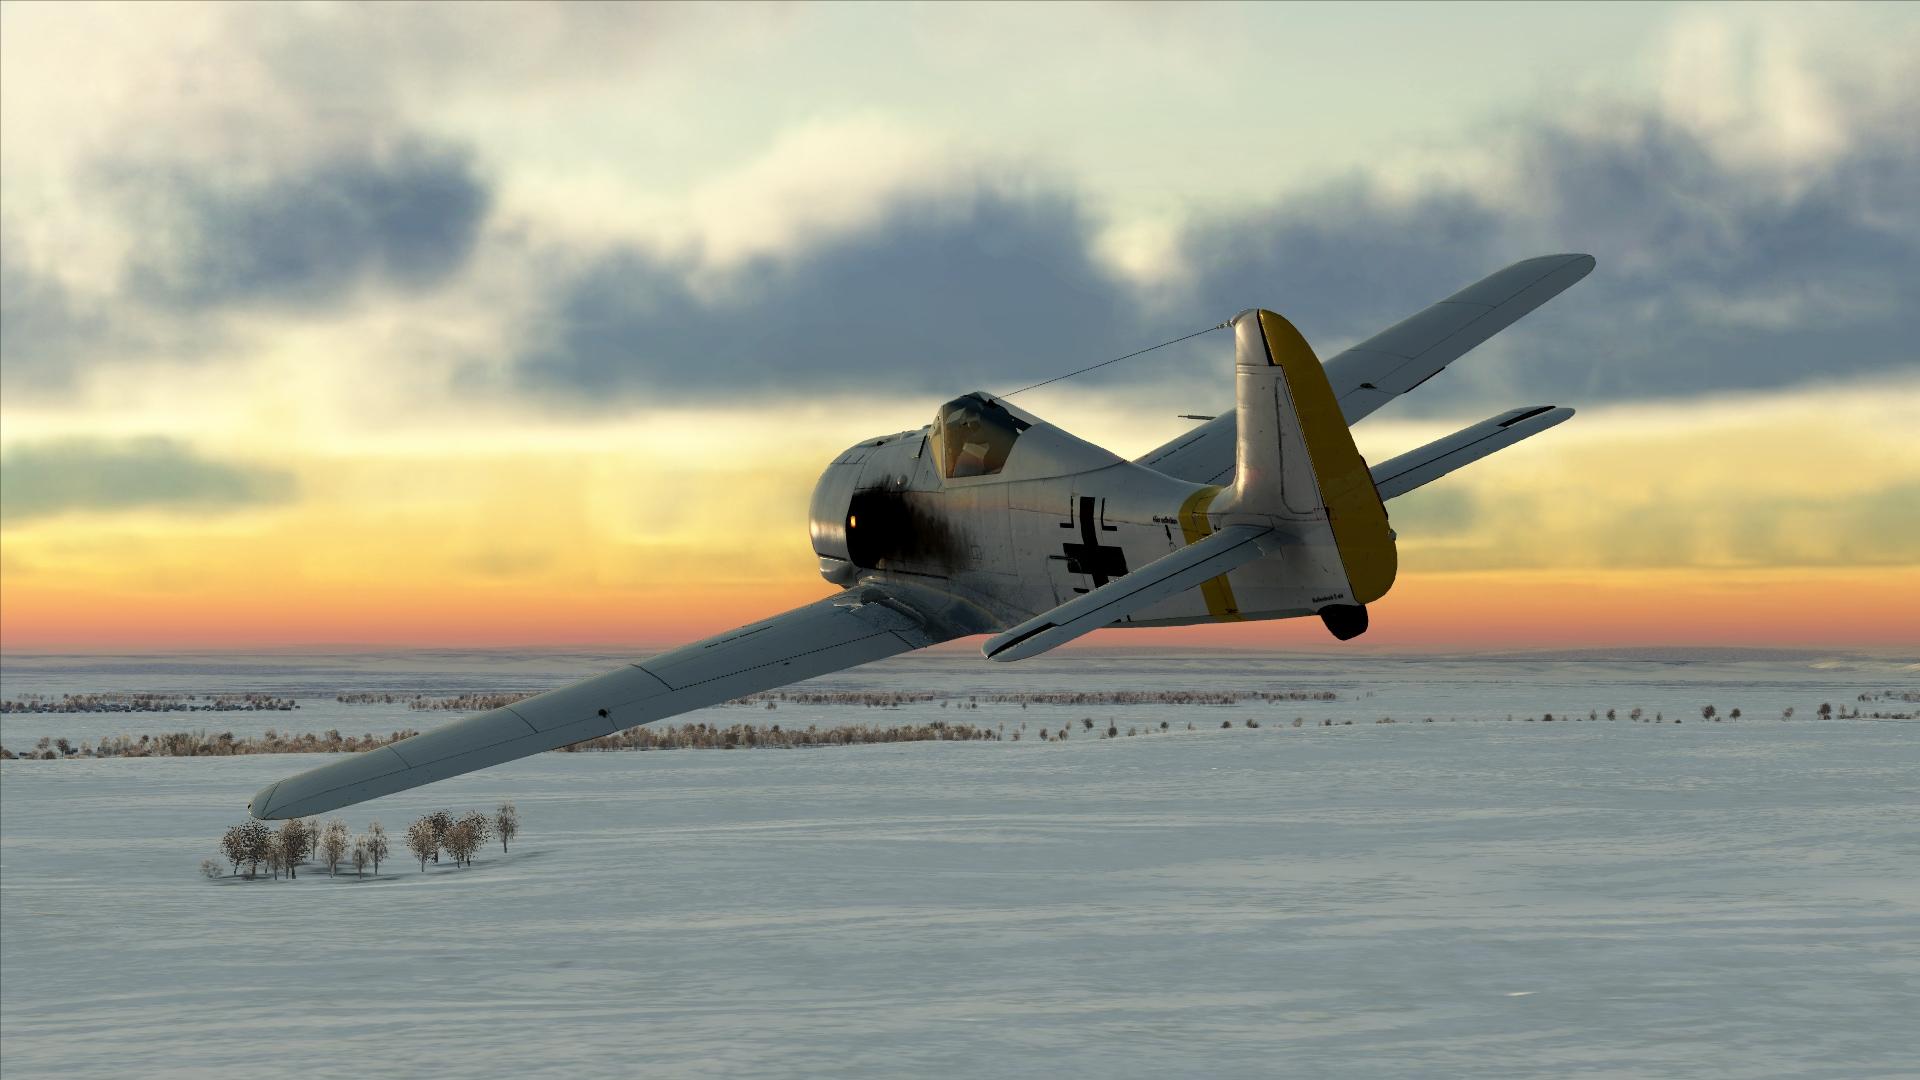 IL-2 Sturmovik: Battle of Moscow Key Steam GLOBAL - G2A COM